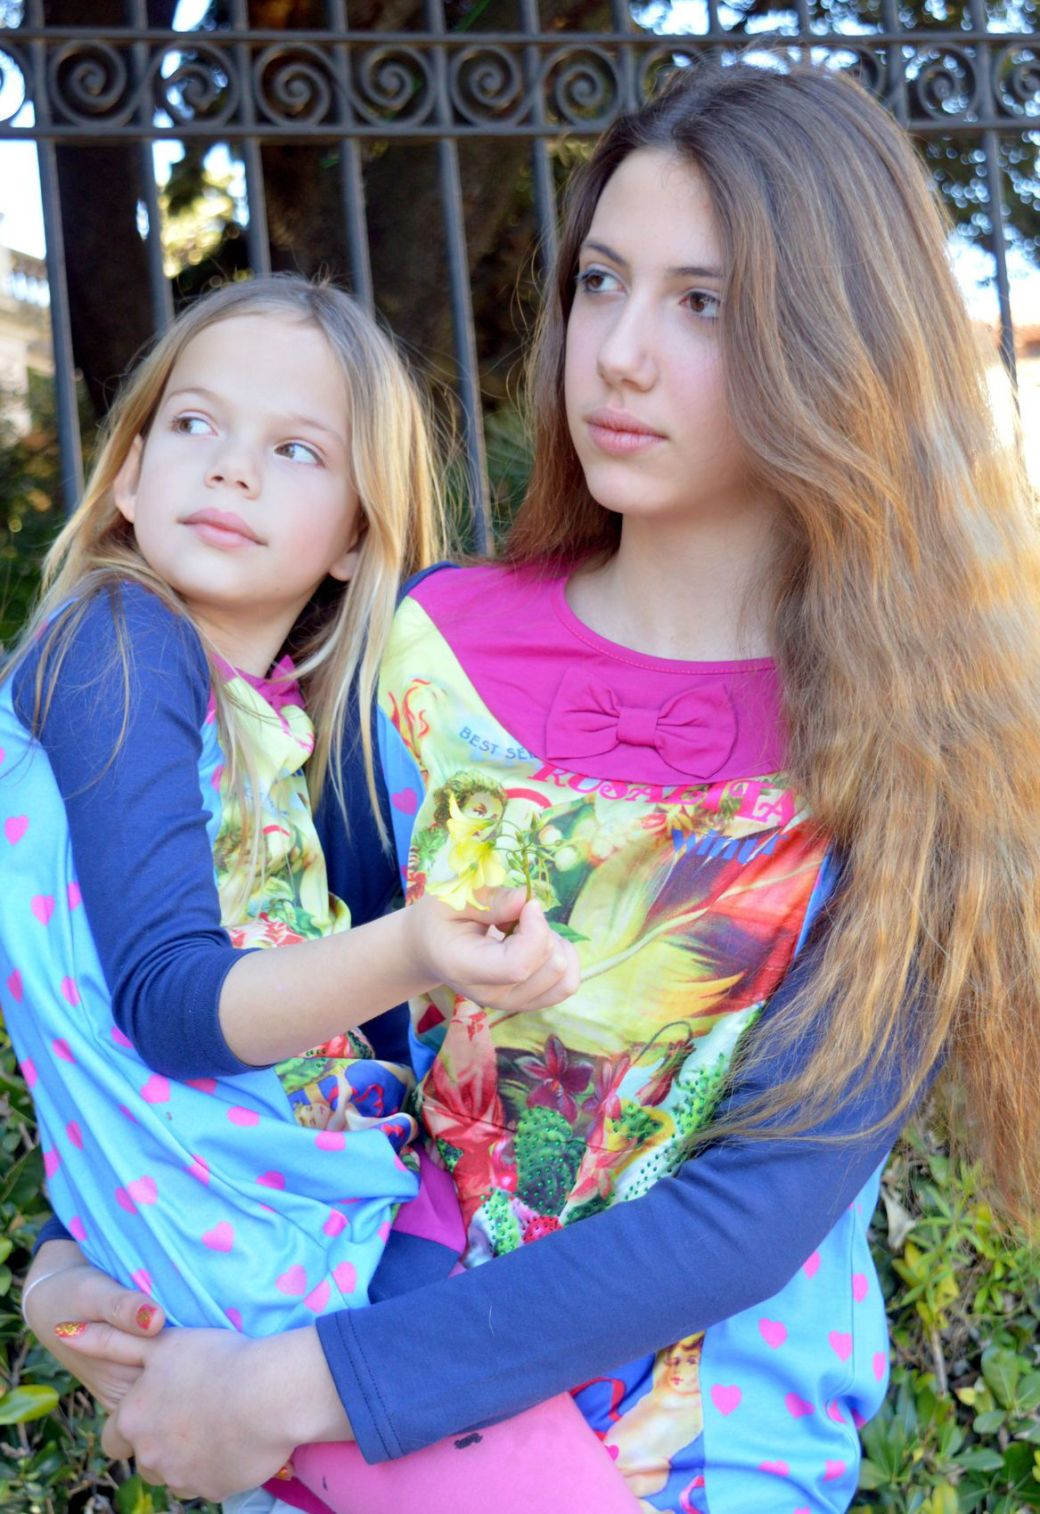 rosalita señoritas moda infantil y juvenil 10.jpg